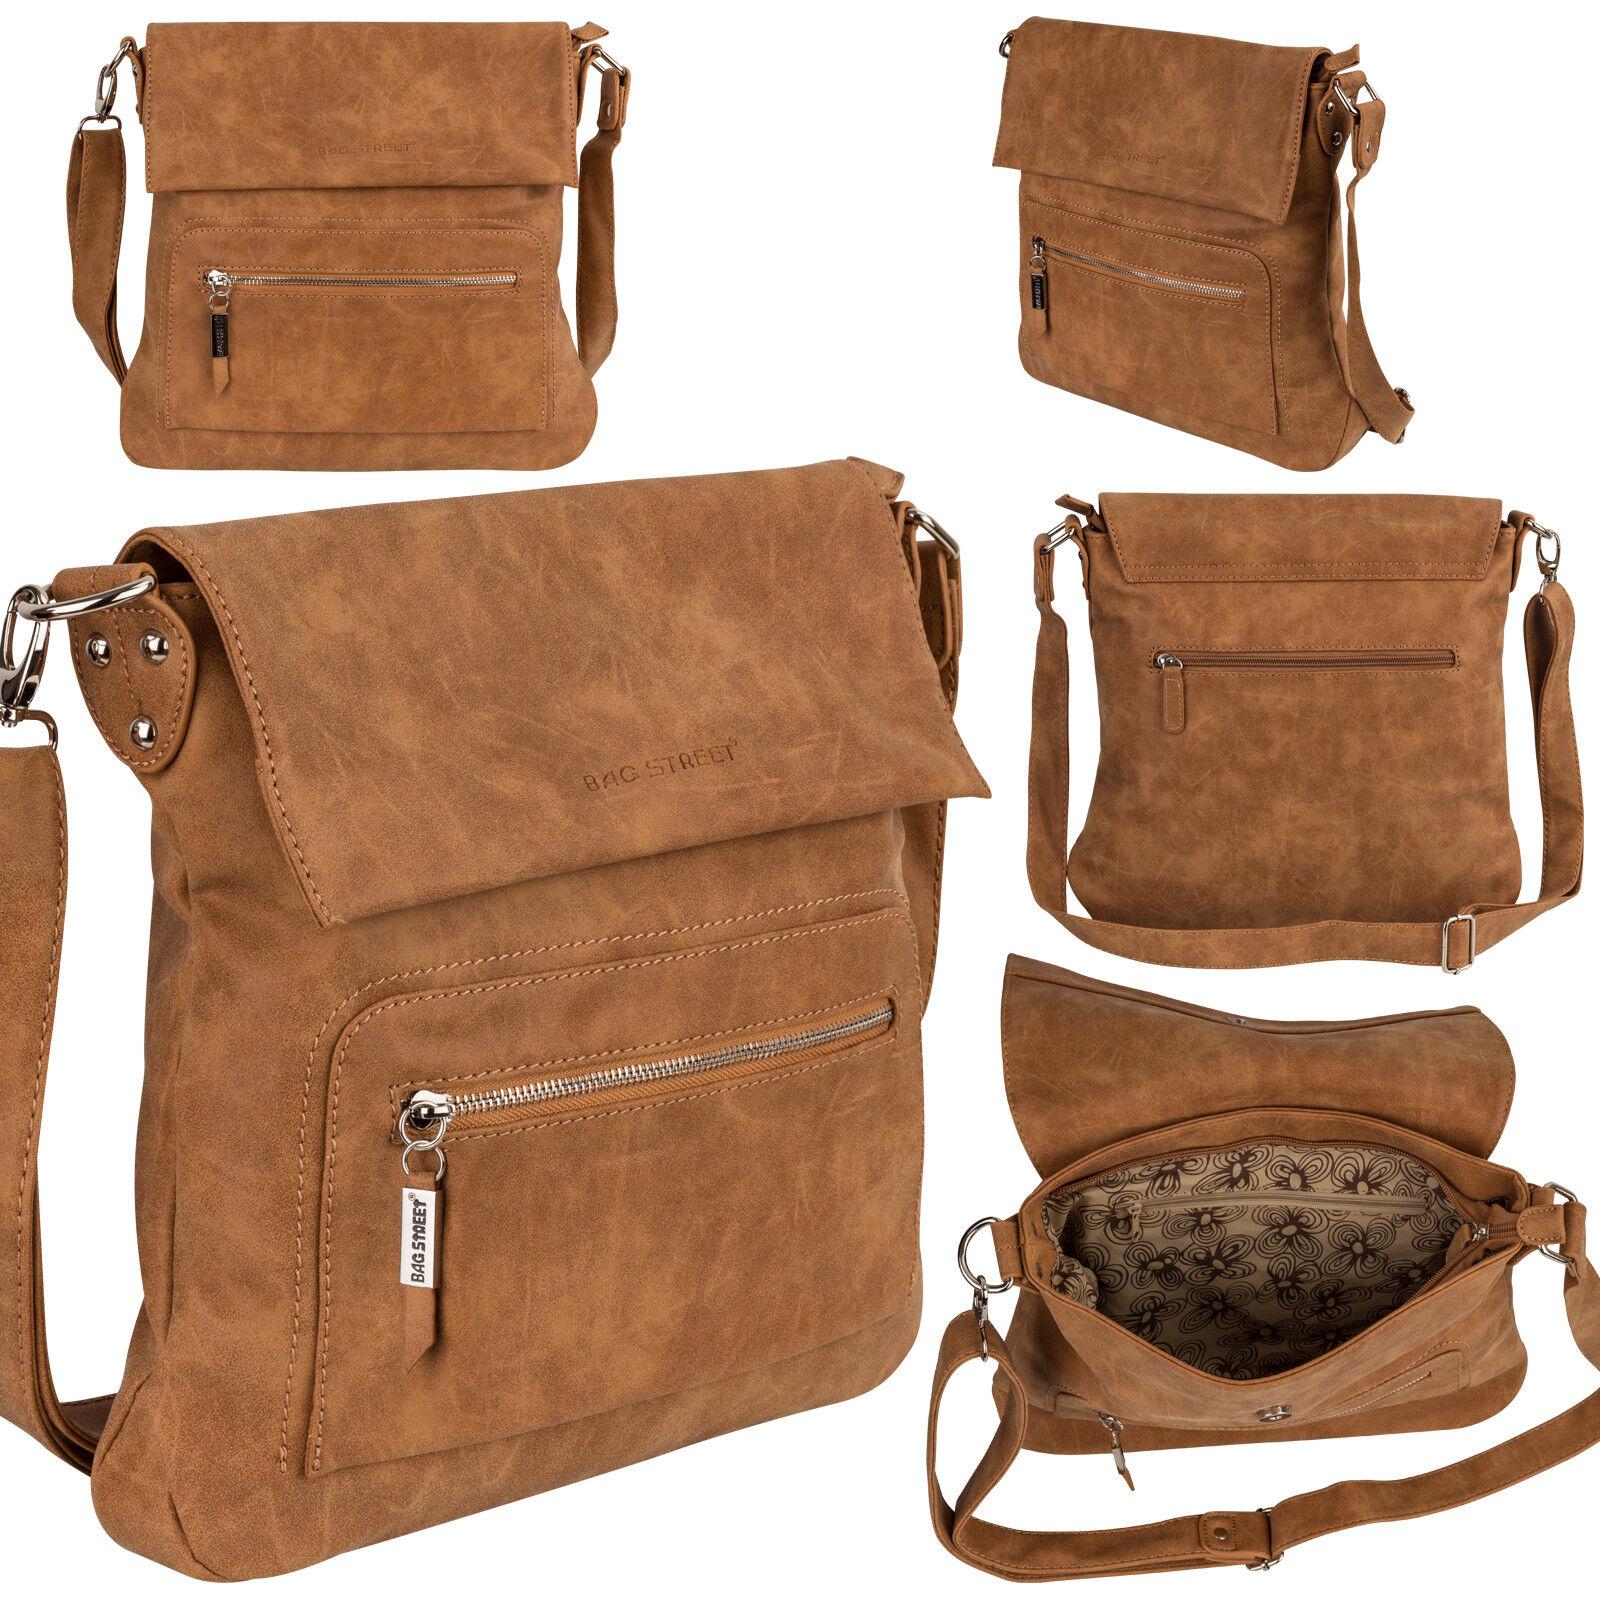 Bag Street Damentasche Umhängetasche Handtasche Schultertasche K2 T0103 Cognac